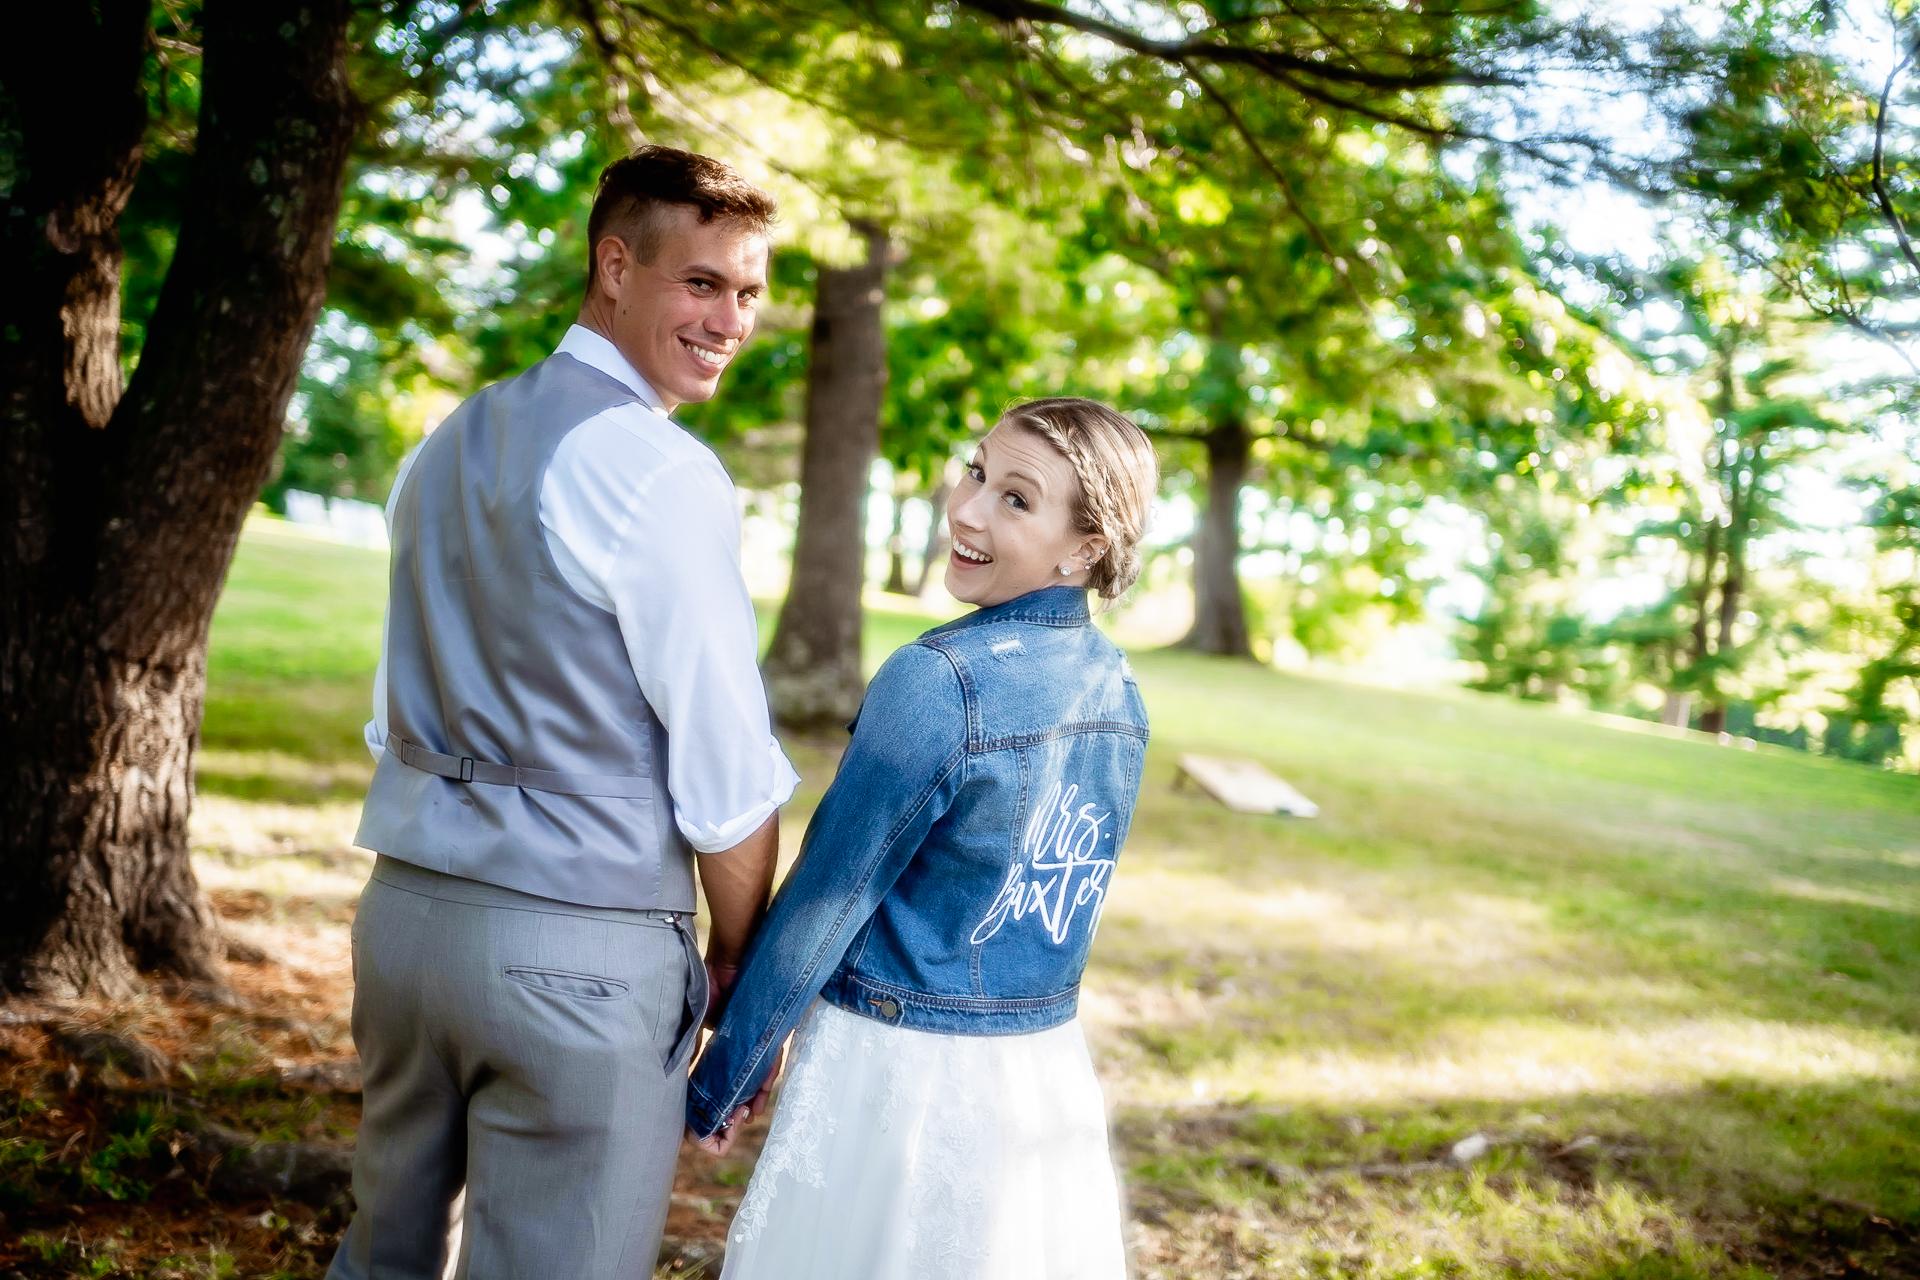 The Hill wedding photographer